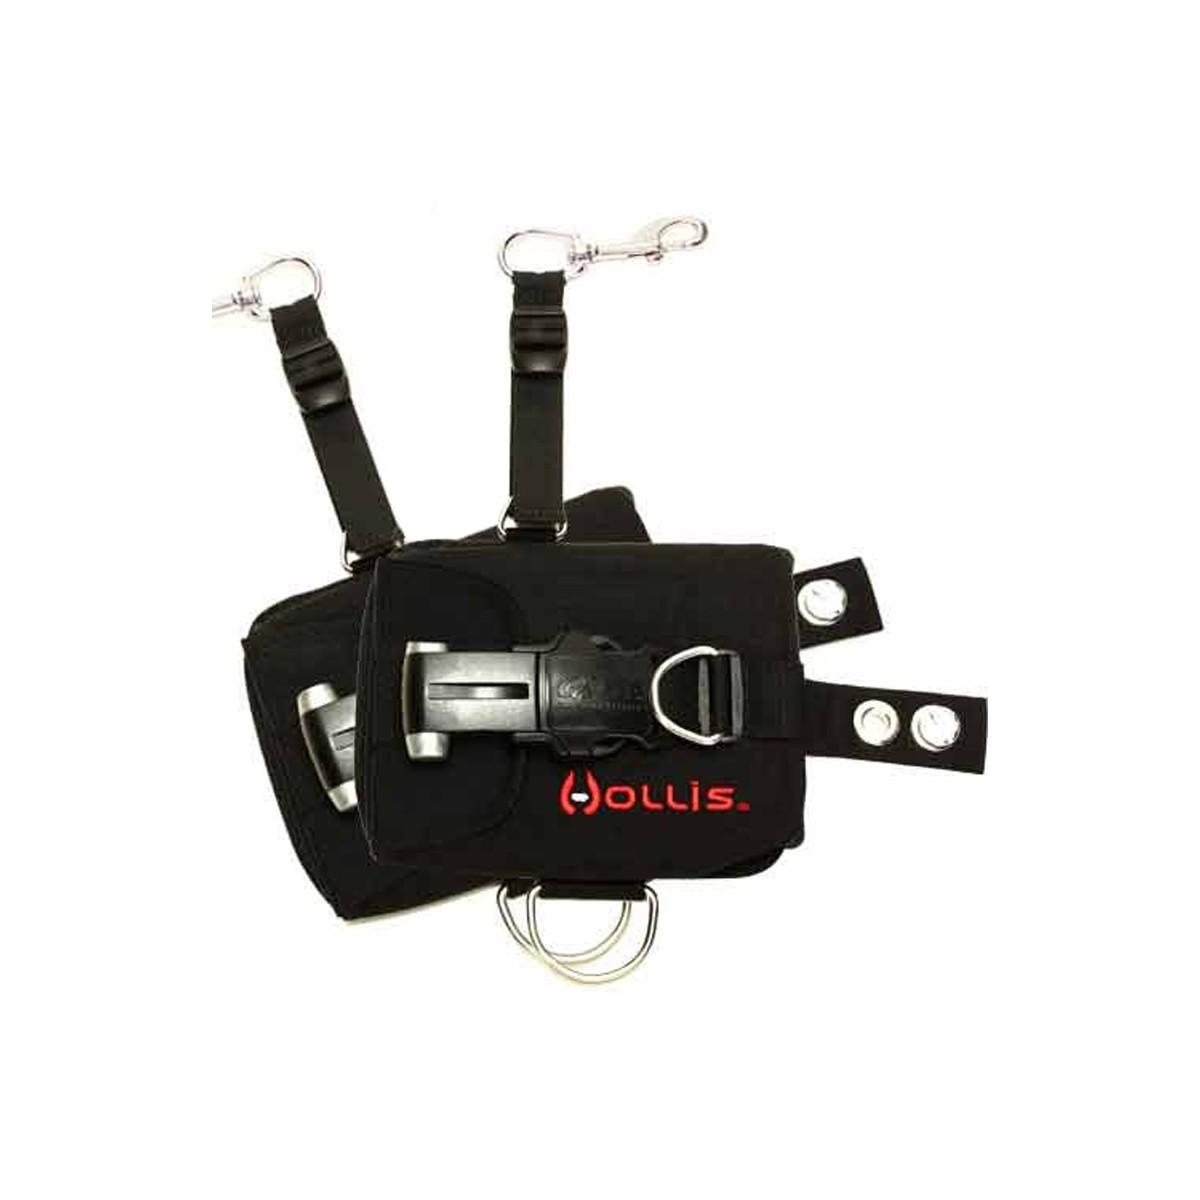 Hollis Hts 2 10 Lb Weight System Qlr 1.5